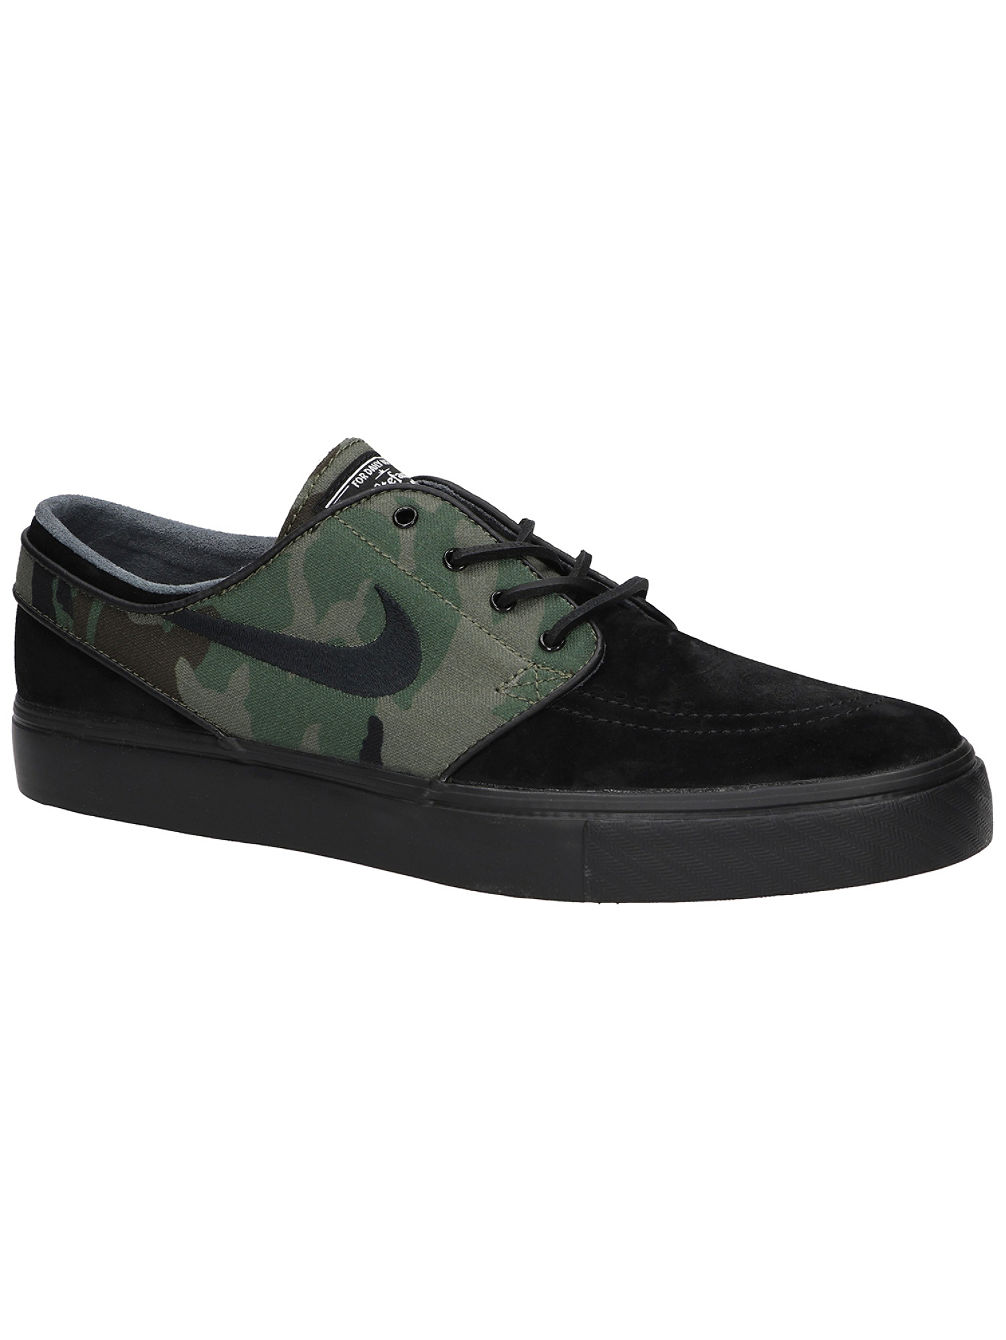 81b07a2db841f Buy Nike Zoom SB Stefan Janoski OG Skate Shoes online at Blue Tomato